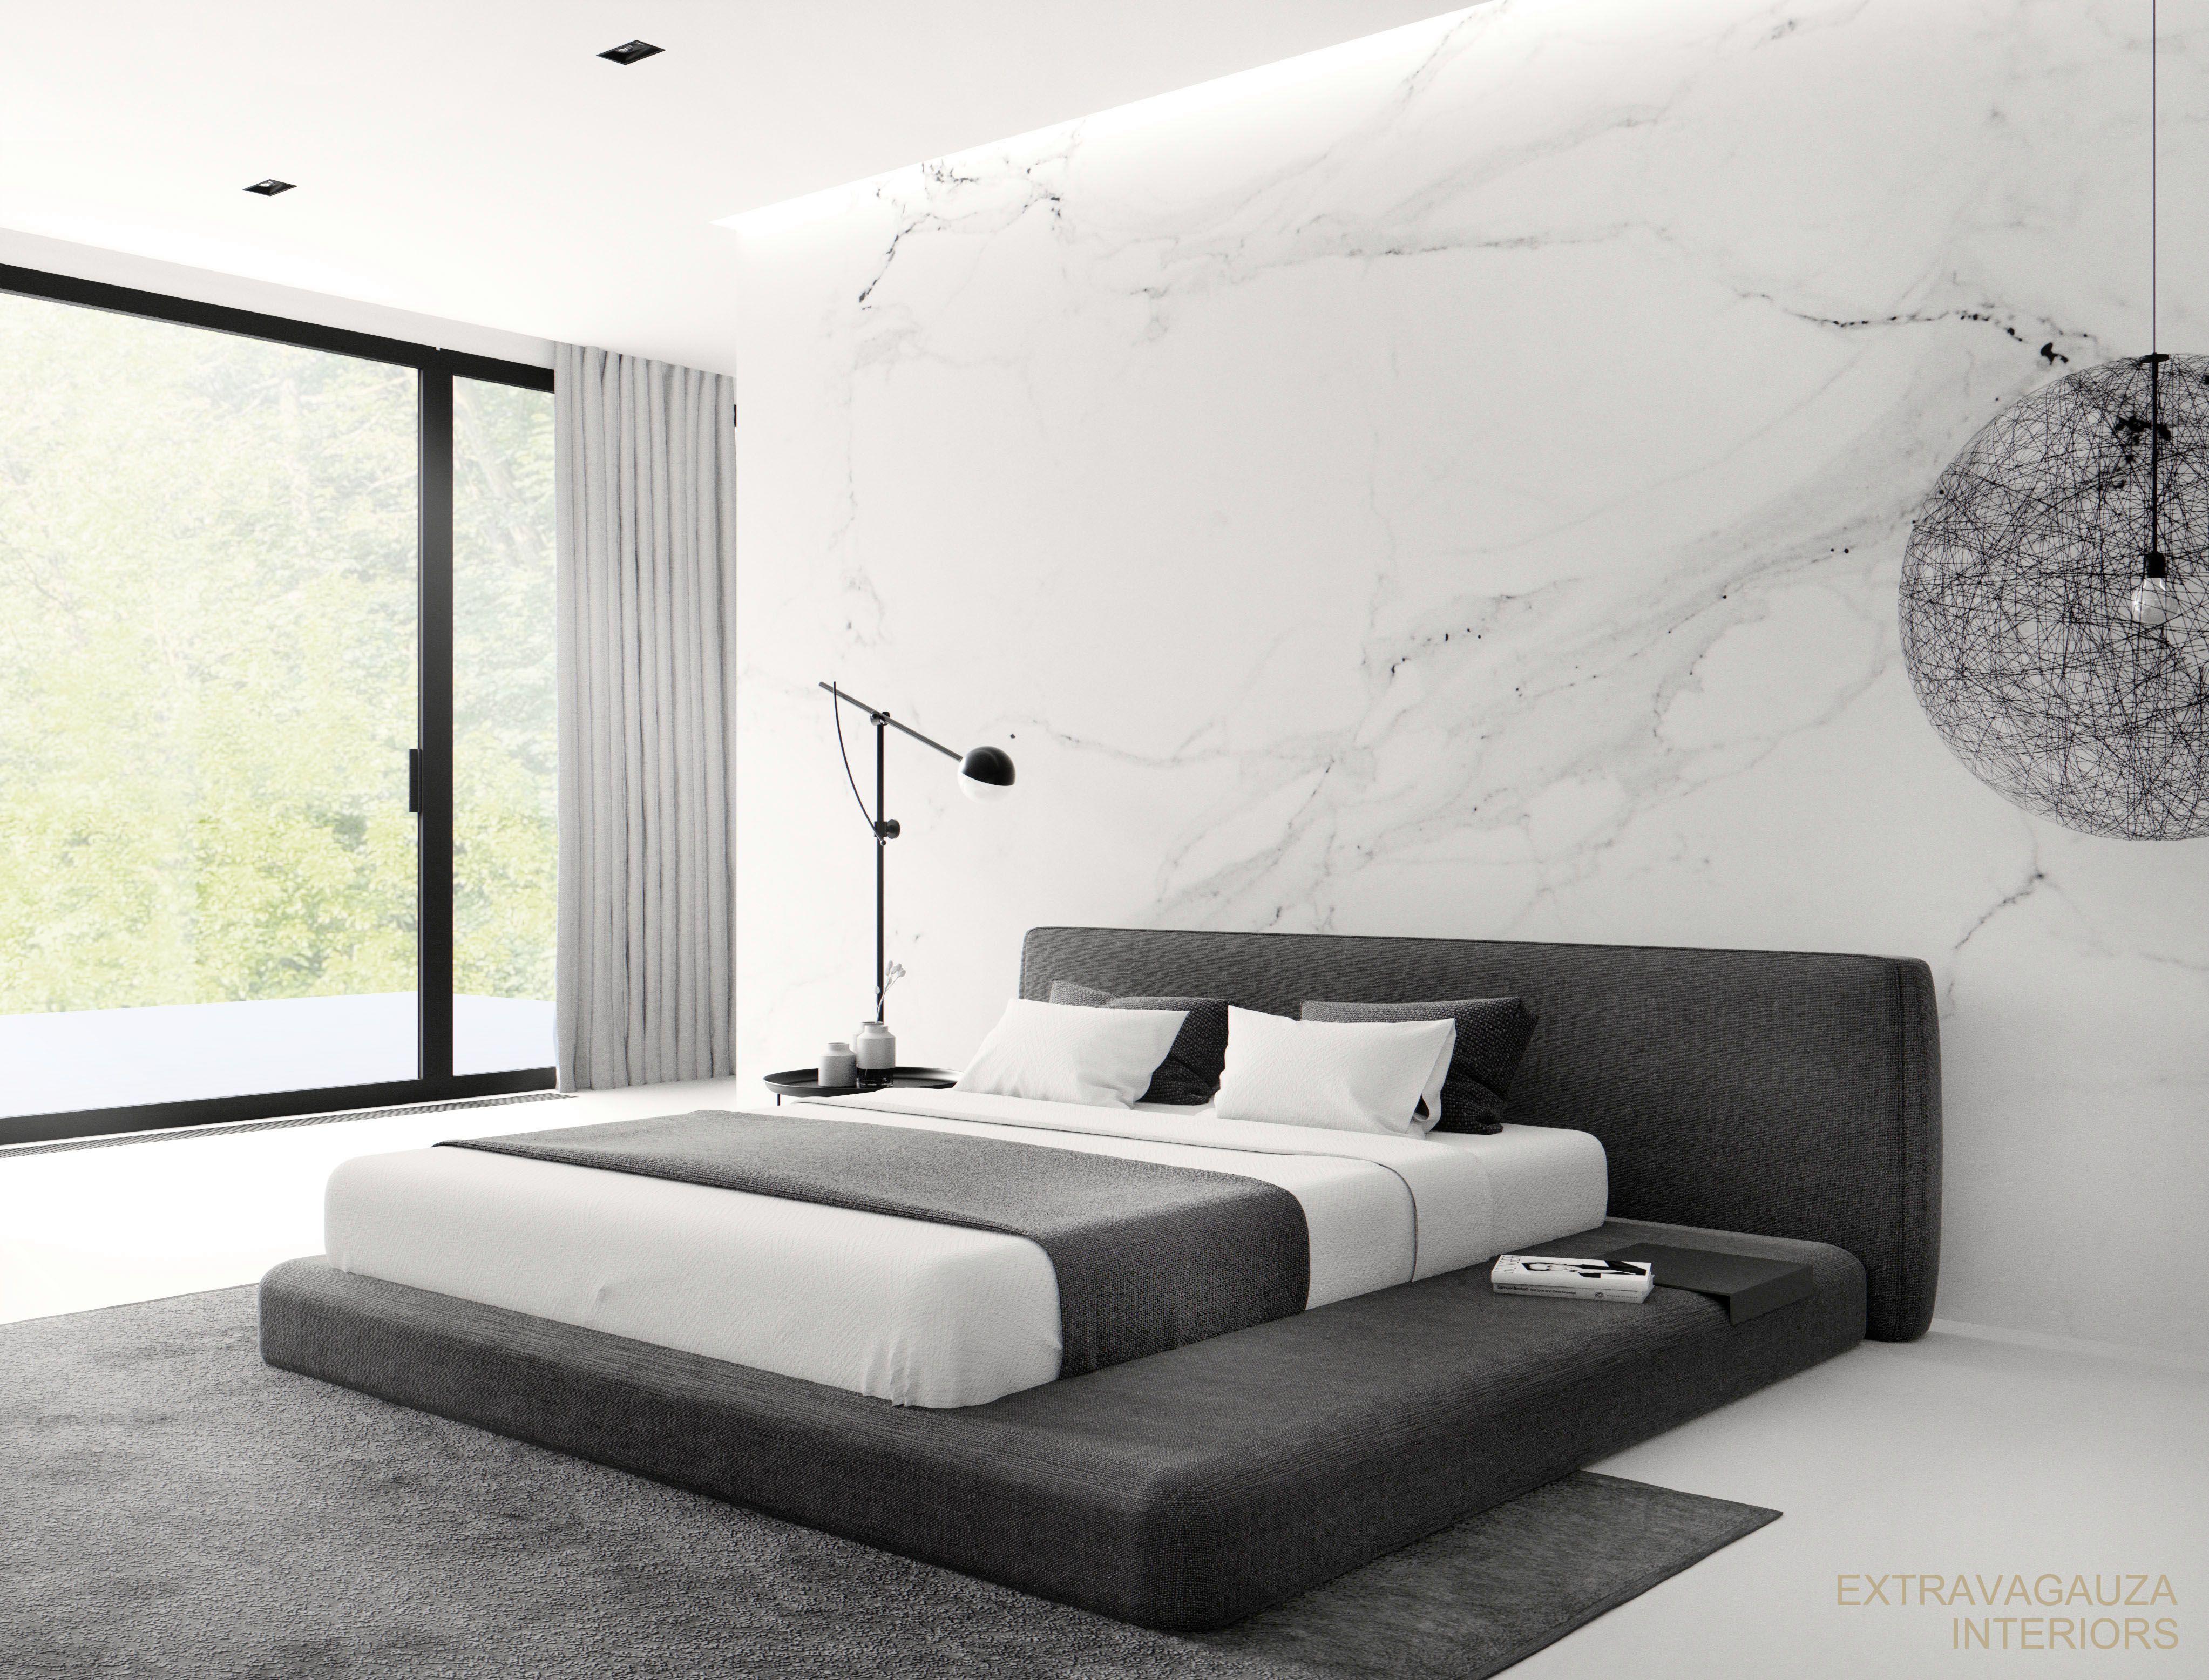 Extravagauza Interiors Contemporary Minimalist Bedroom Interior Design Www Extravagauza